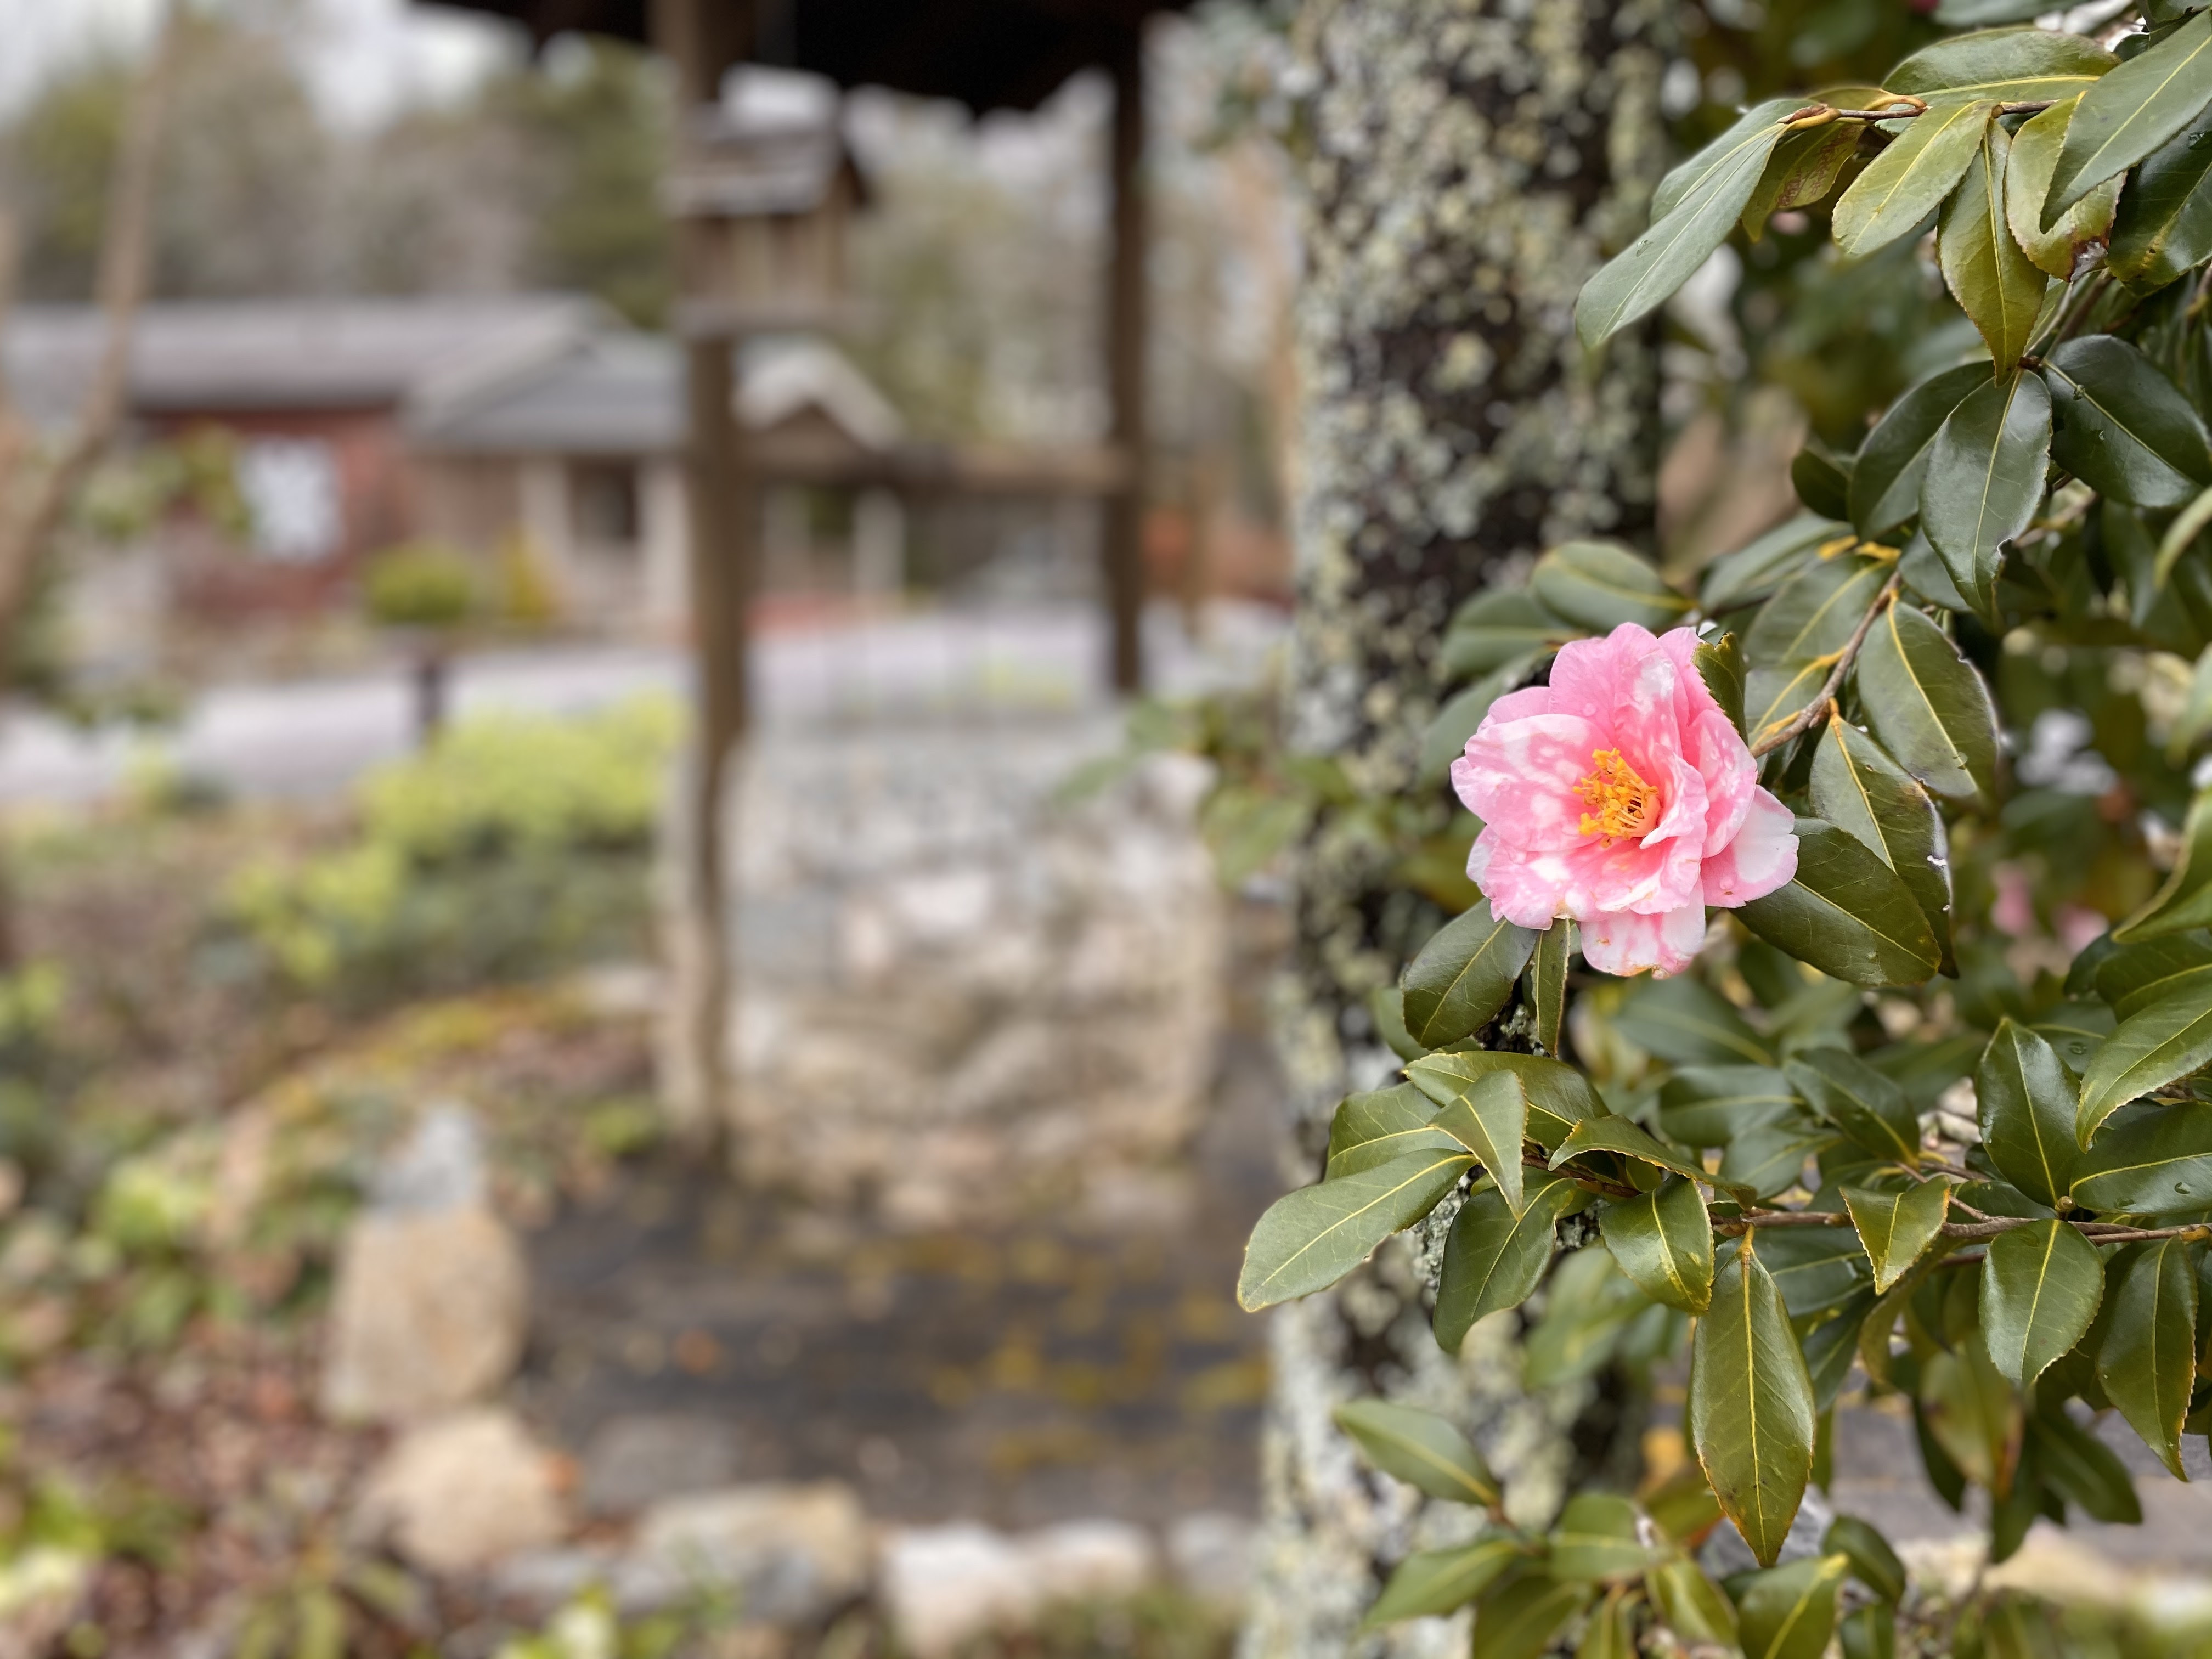 Pink flower blooming near                     wishing well.